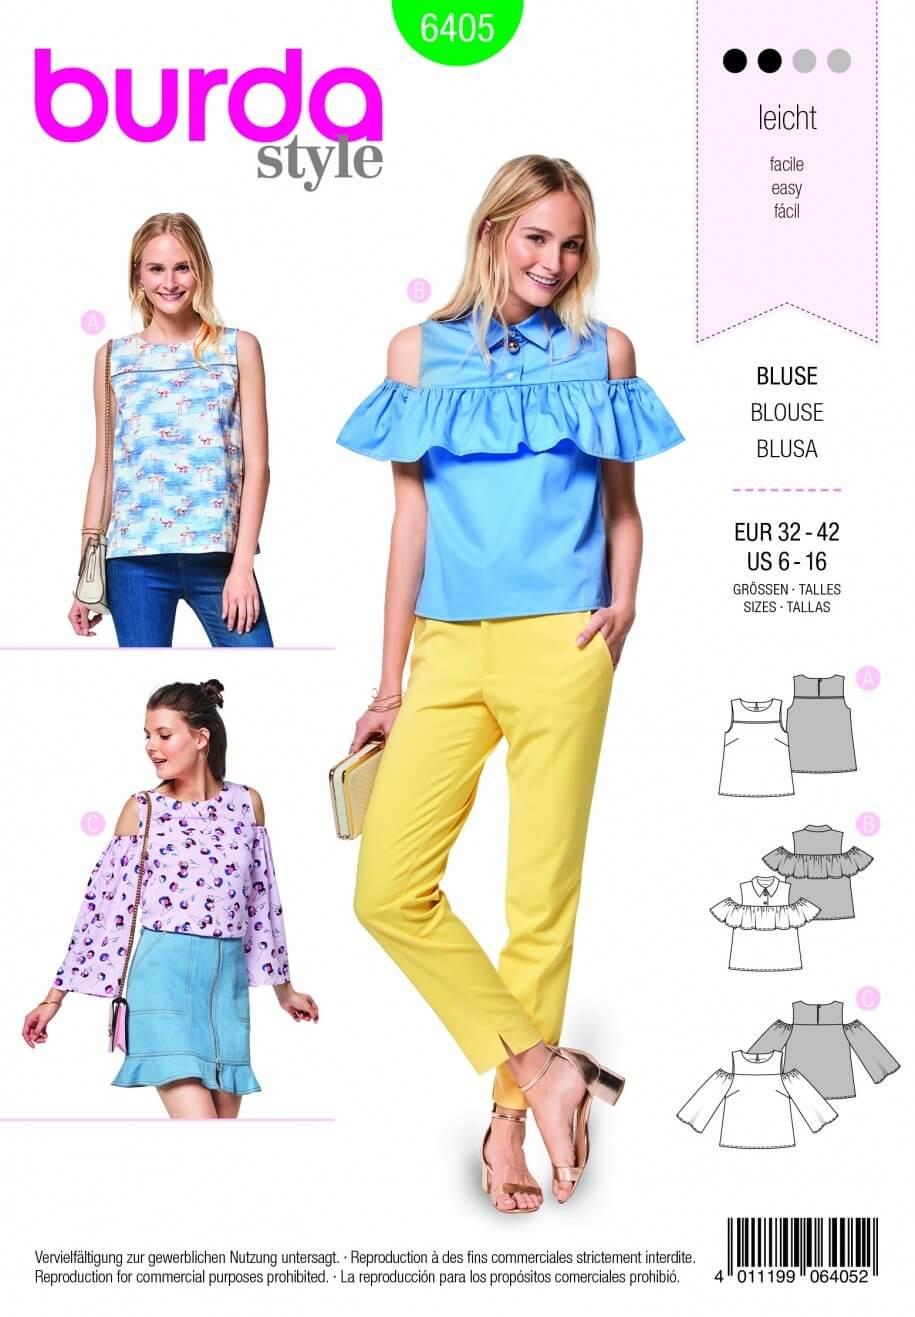 Burda Style Trio Of Summer Tops Fabric Sewing Pattern 6405